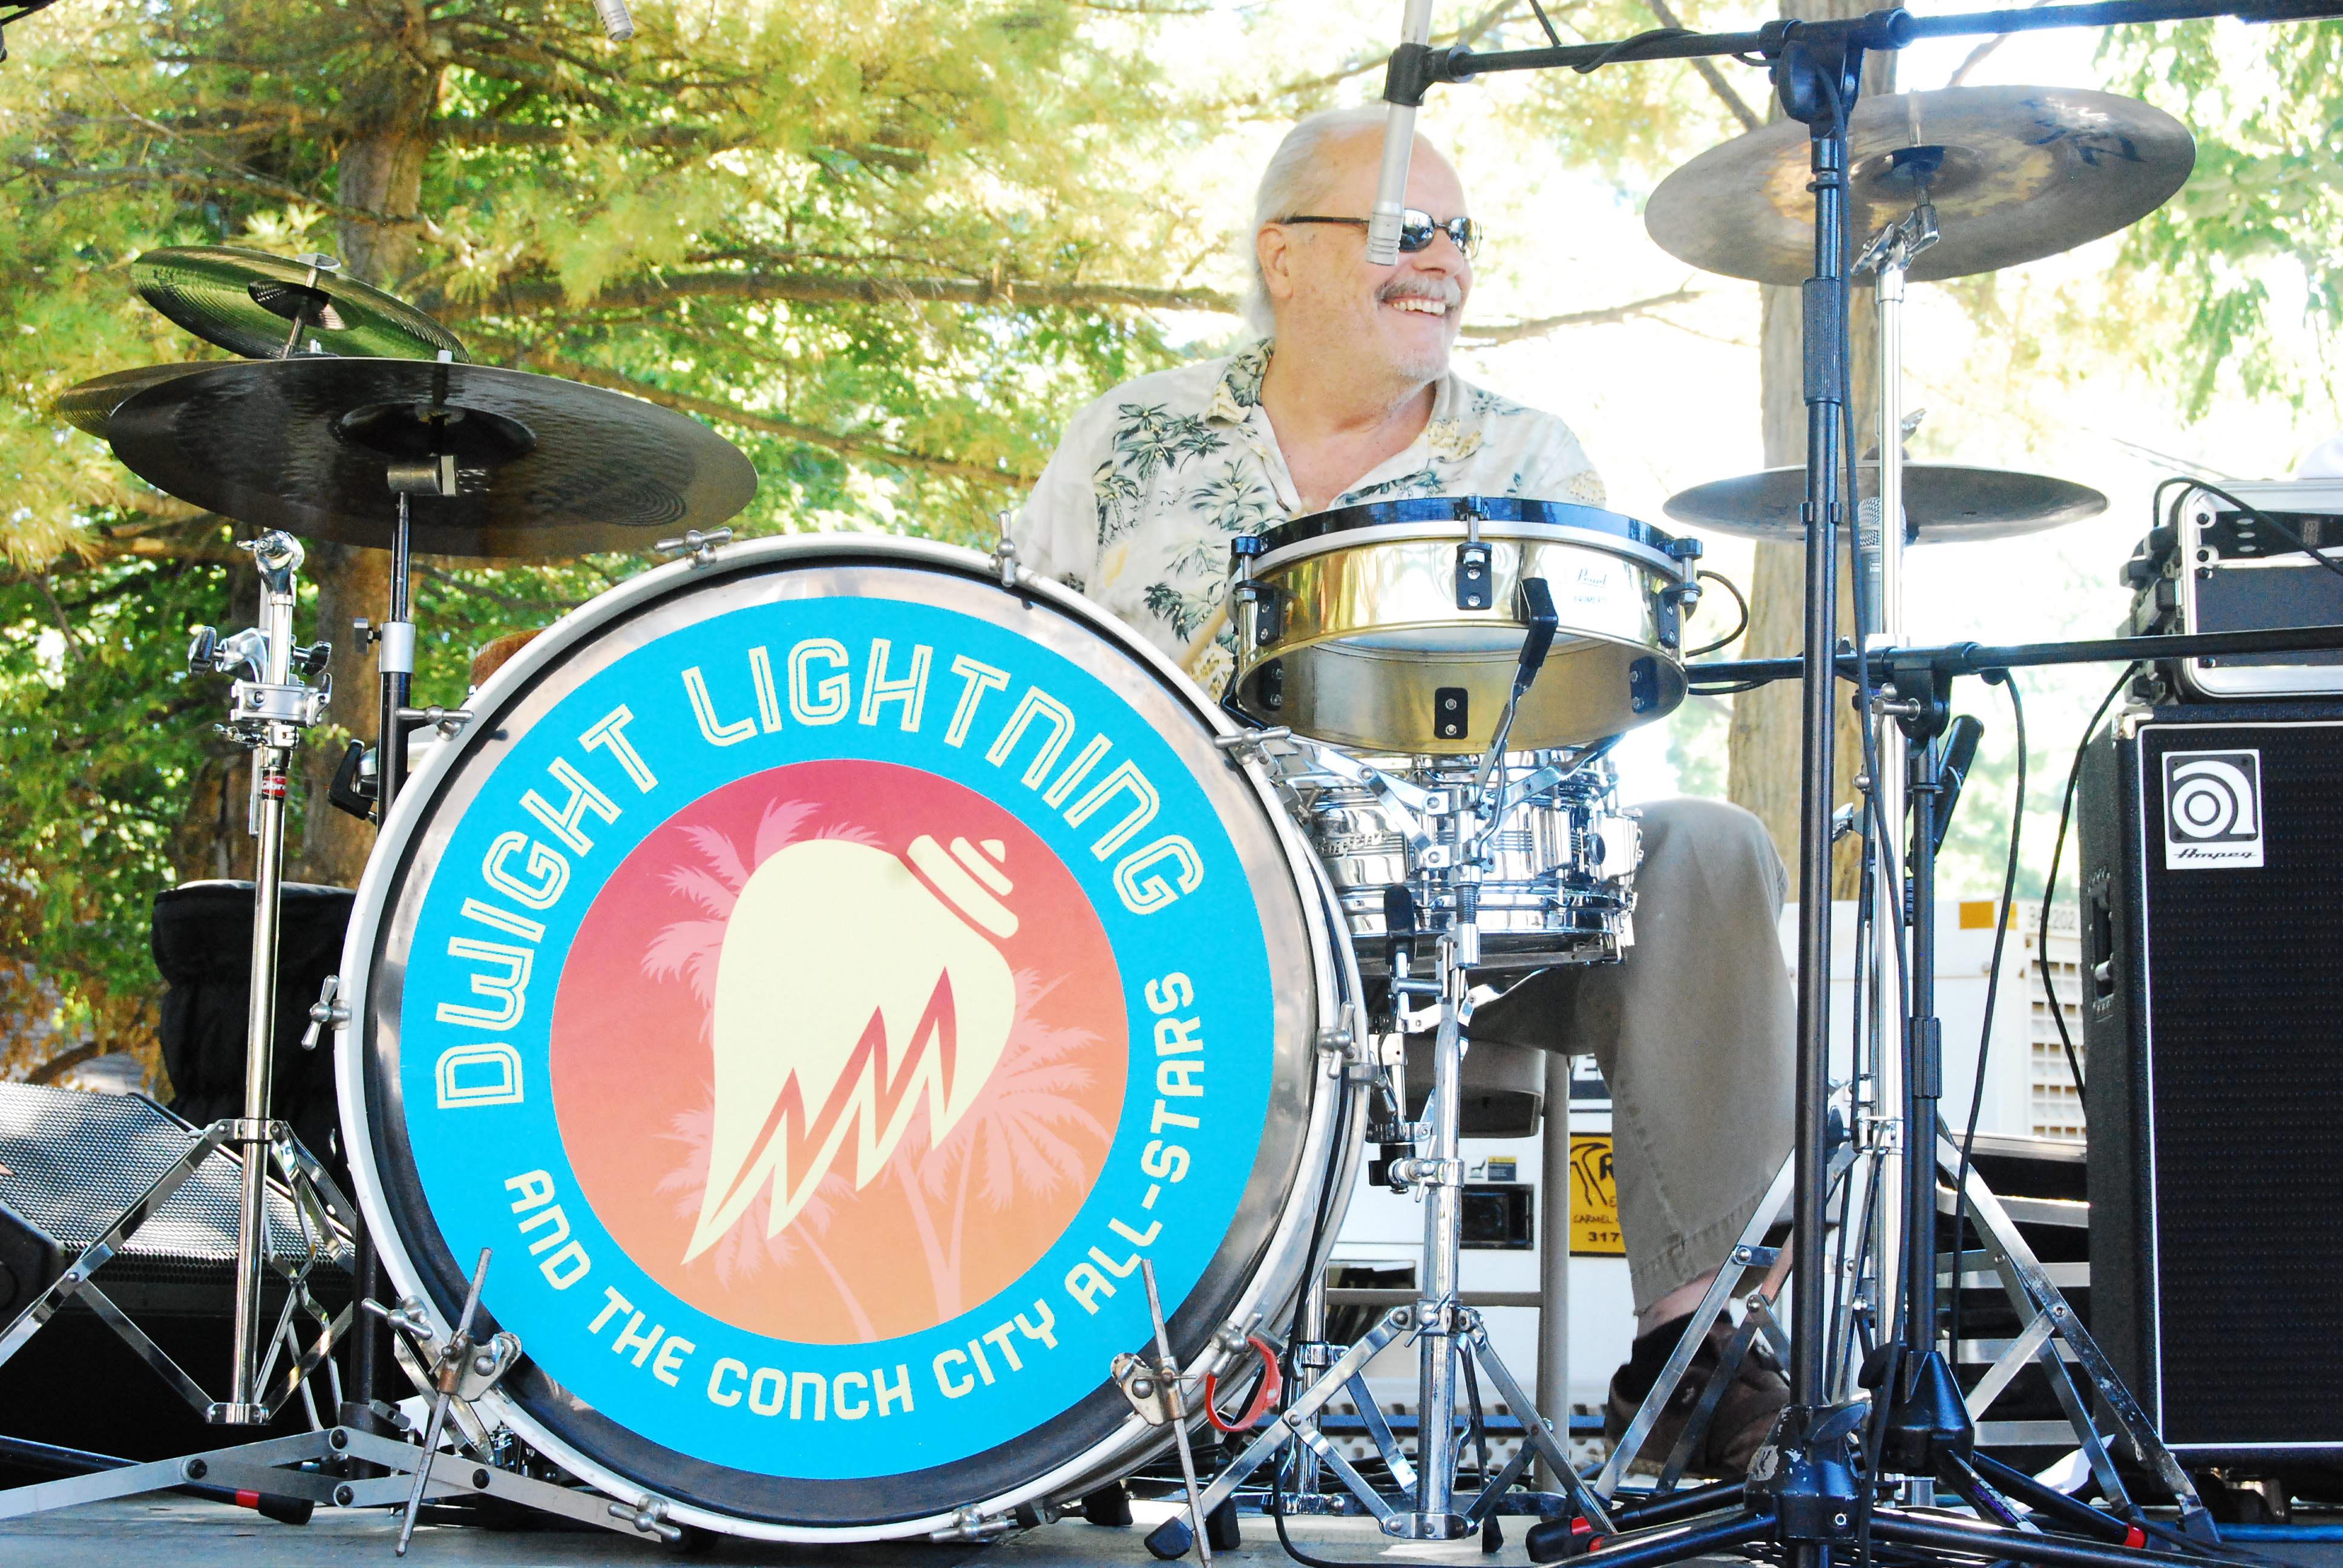 Dwight Lightning & The Conch City Al